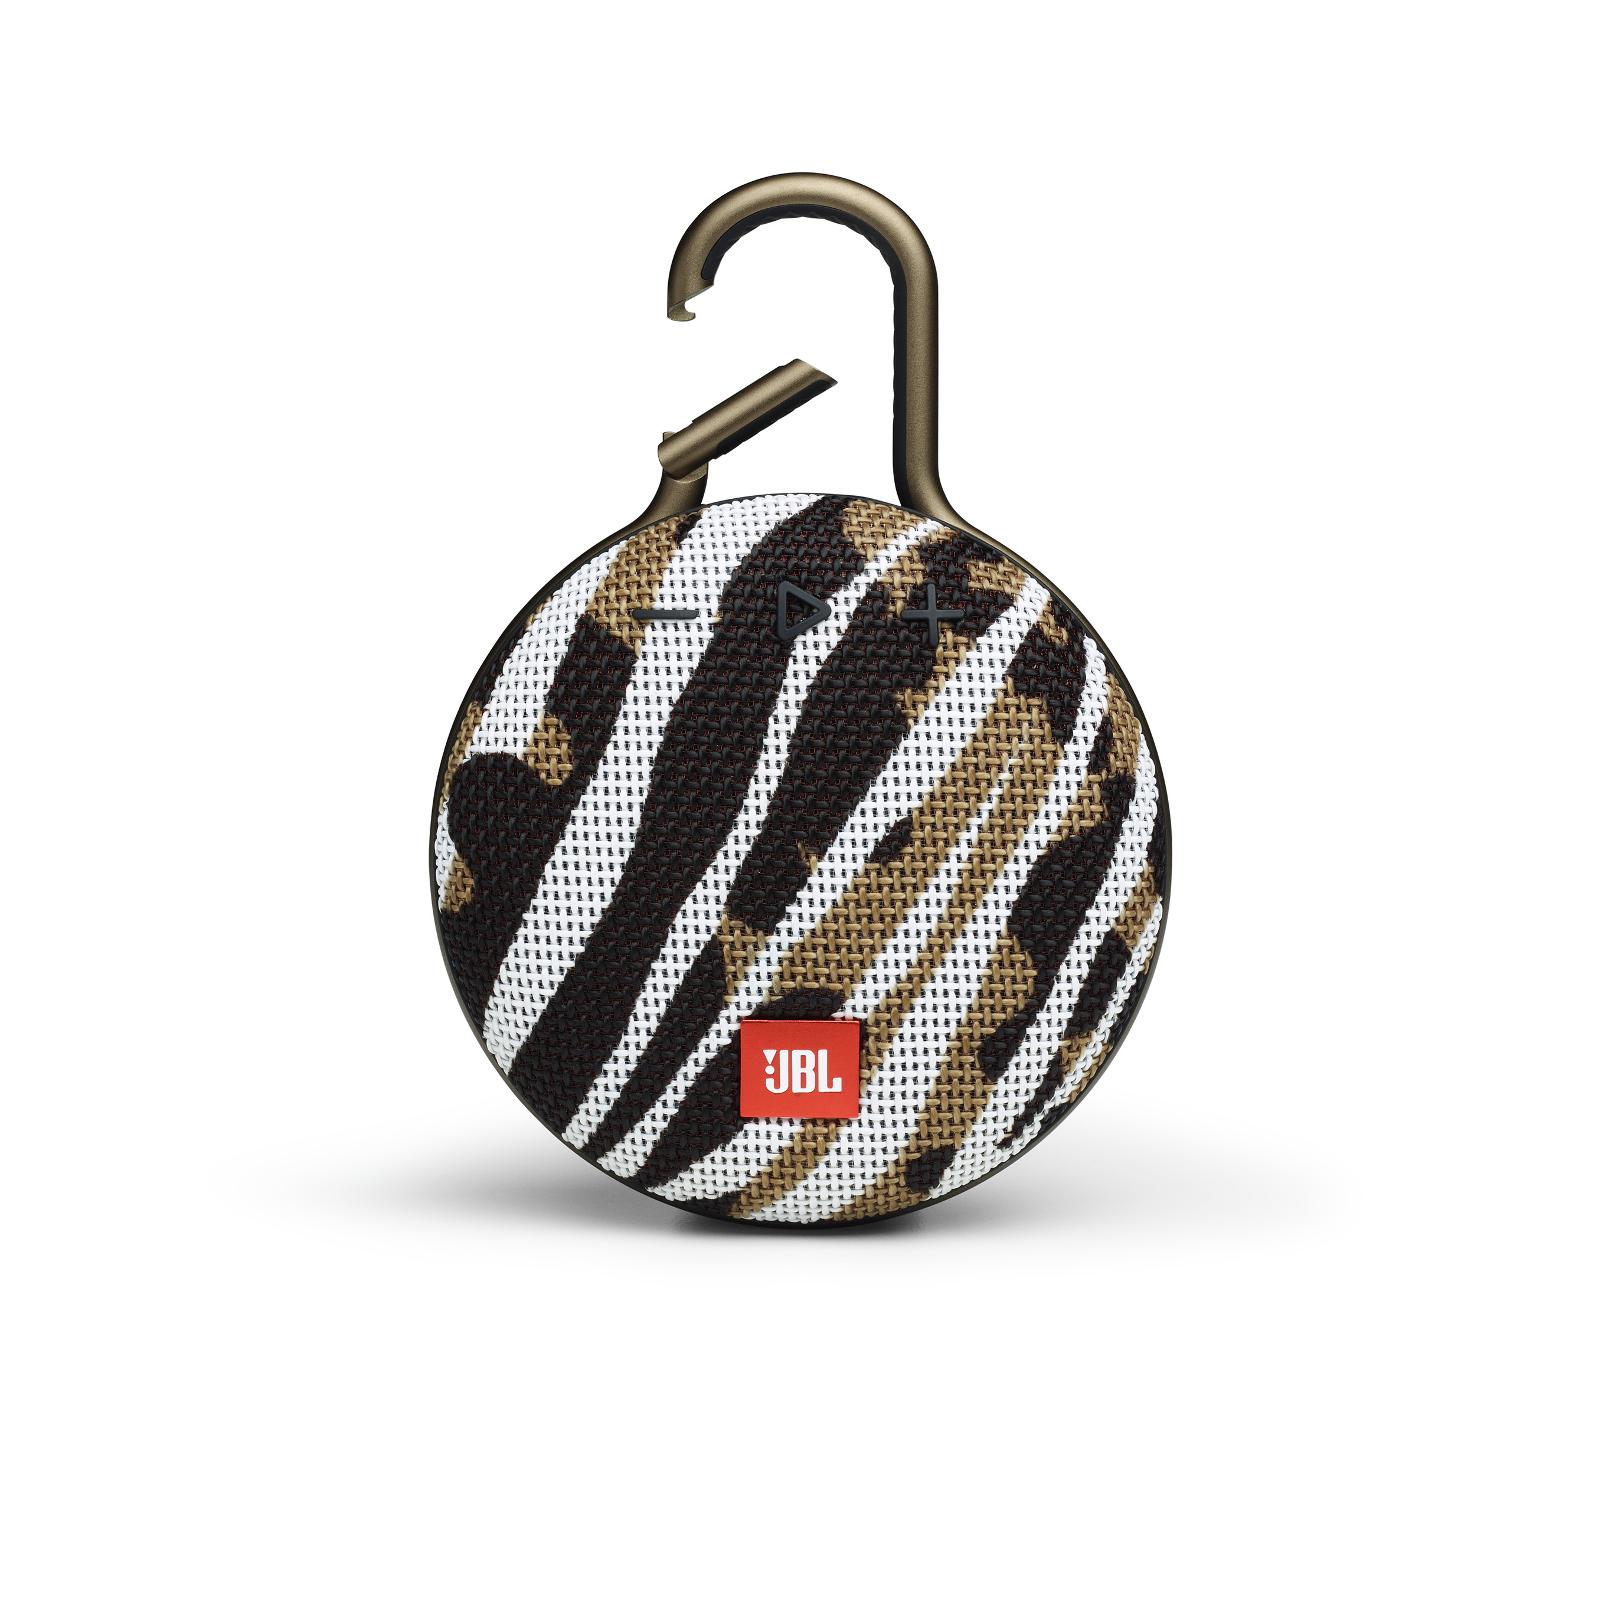 JBL CLIP 3 - BlackWhite/Brown Camo - Portable Bluetooth® speaker - Front